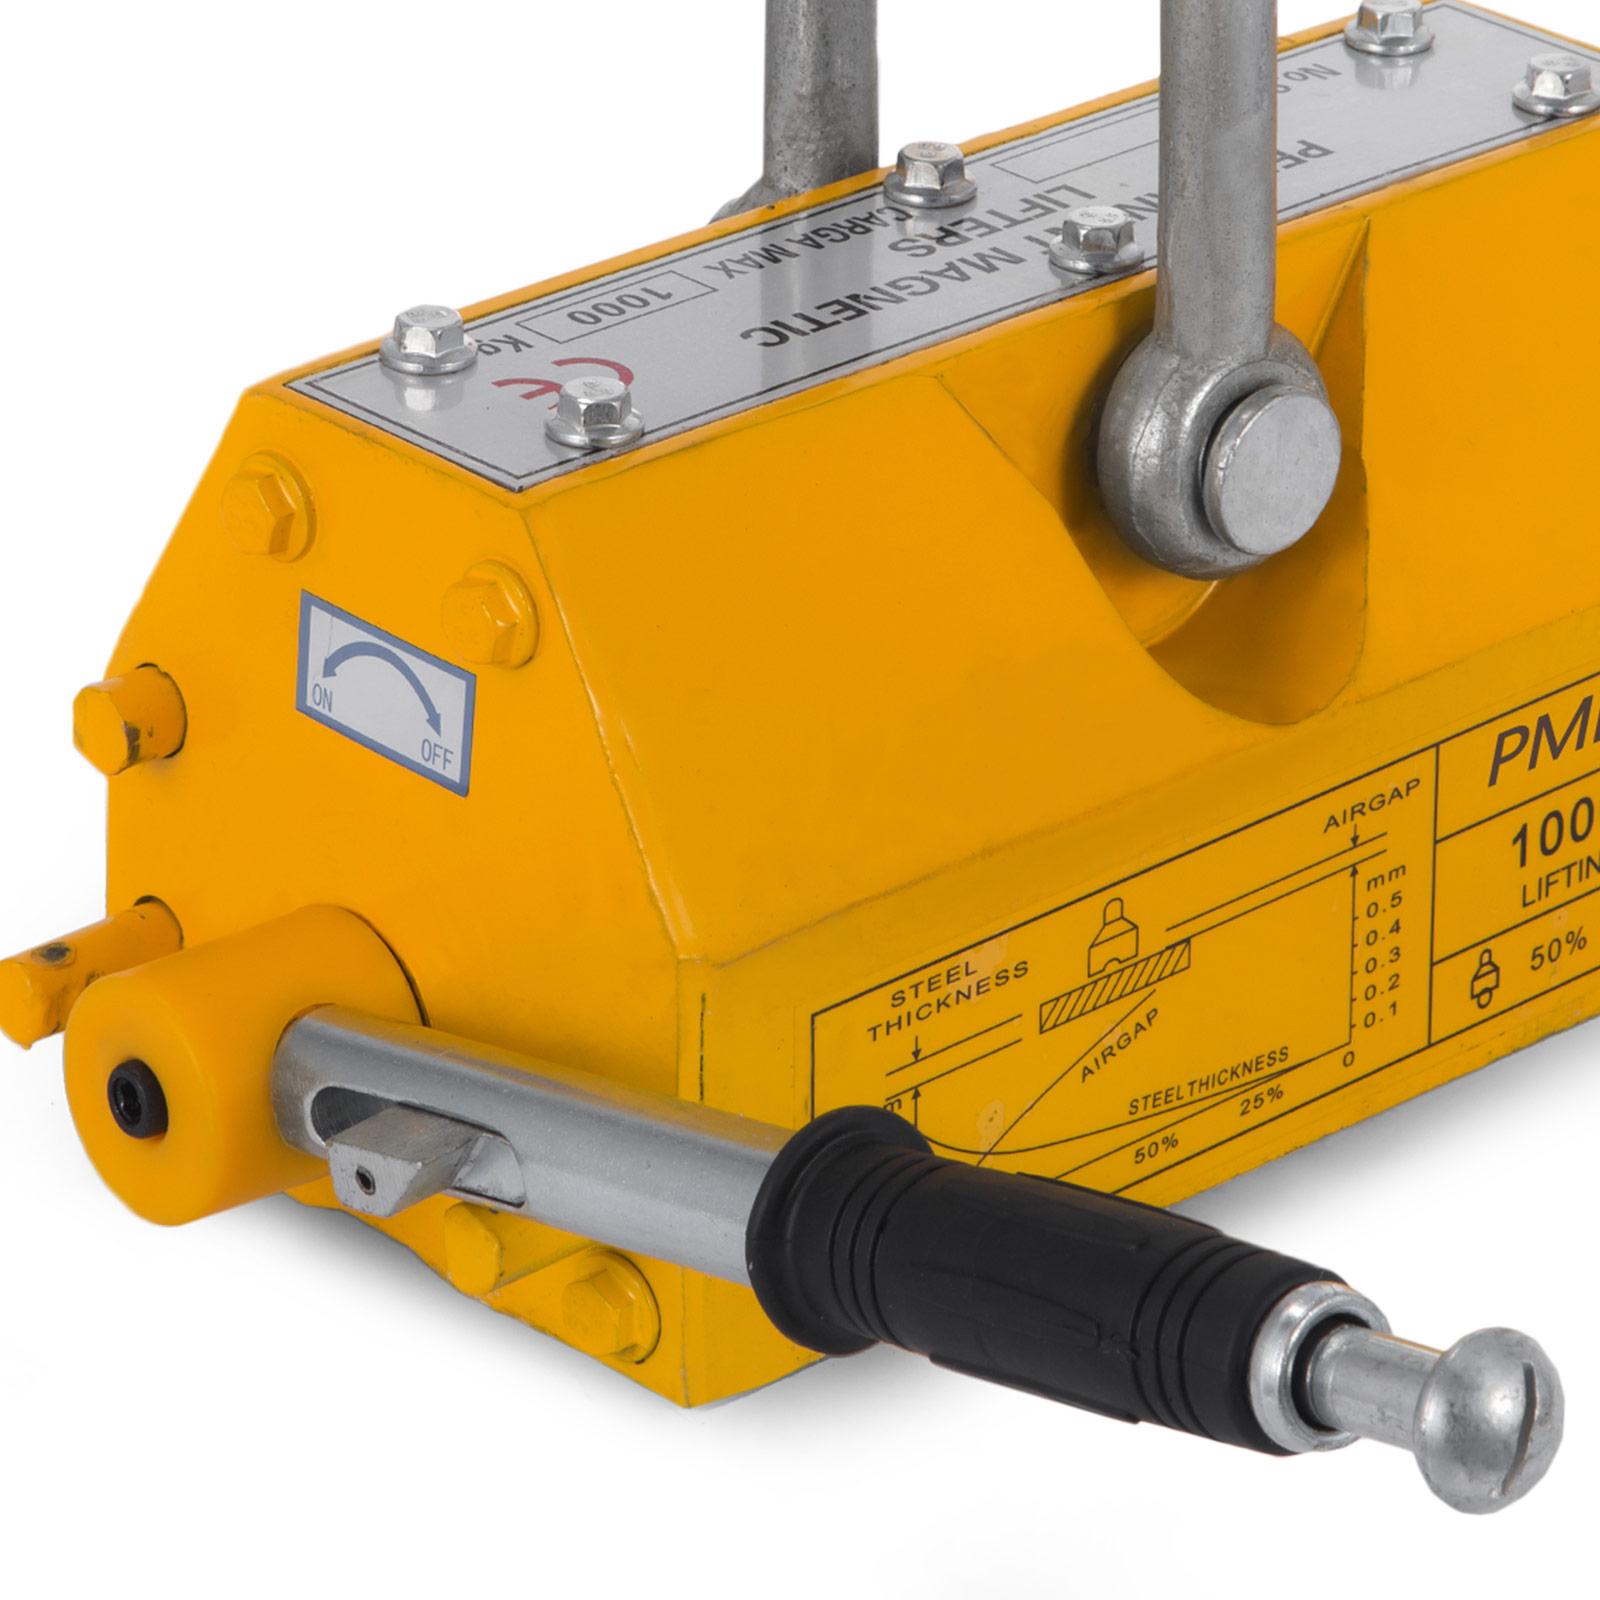 100-300-600-1000KG-Steel-Magnetic-Lifter-Heavy-Duty-Crane-Hoist-Lifting-Magnet miniature 71